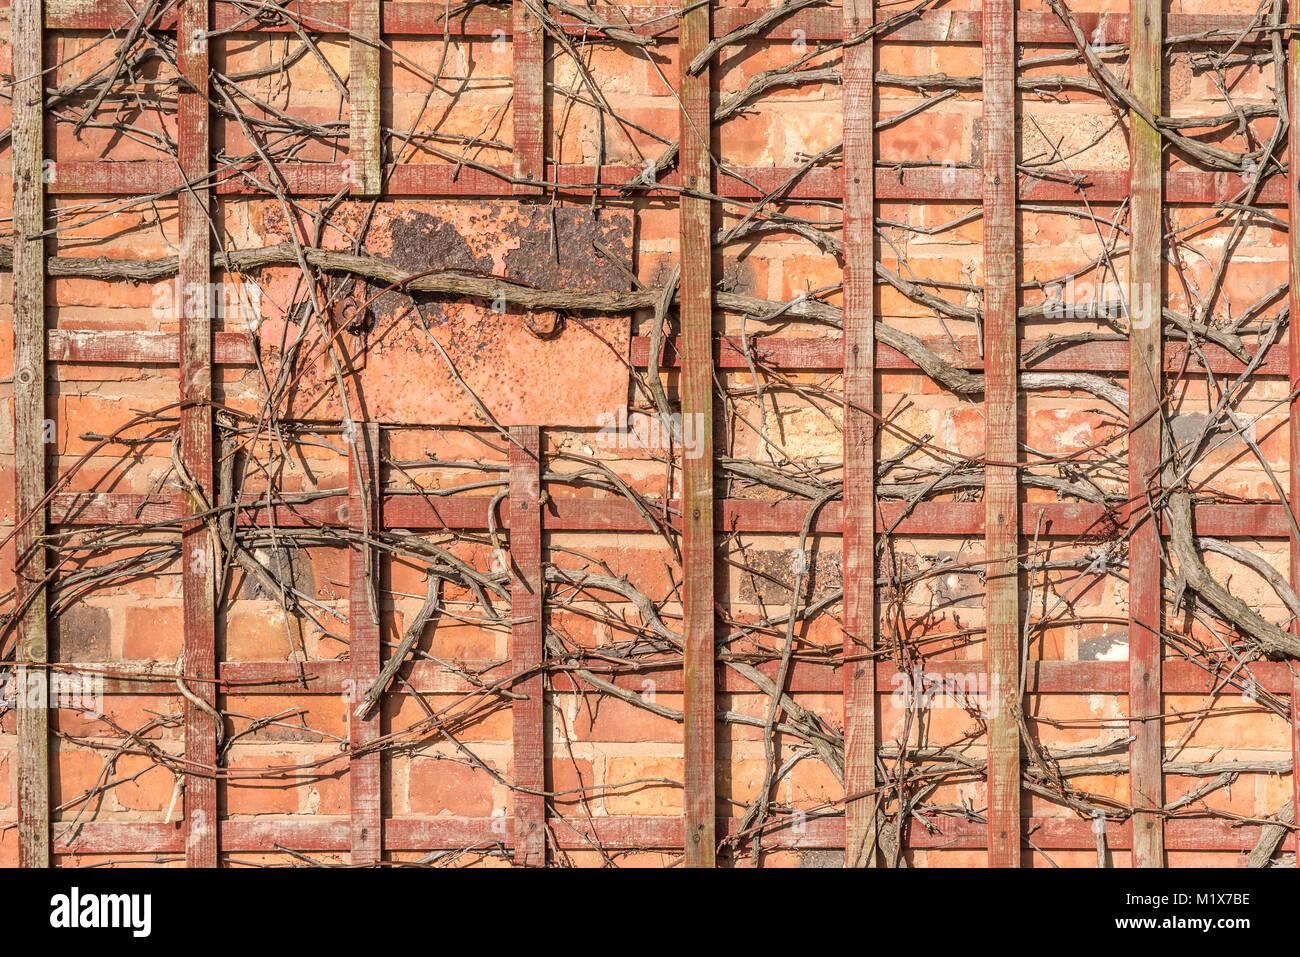 how to fix trellis to brick wall